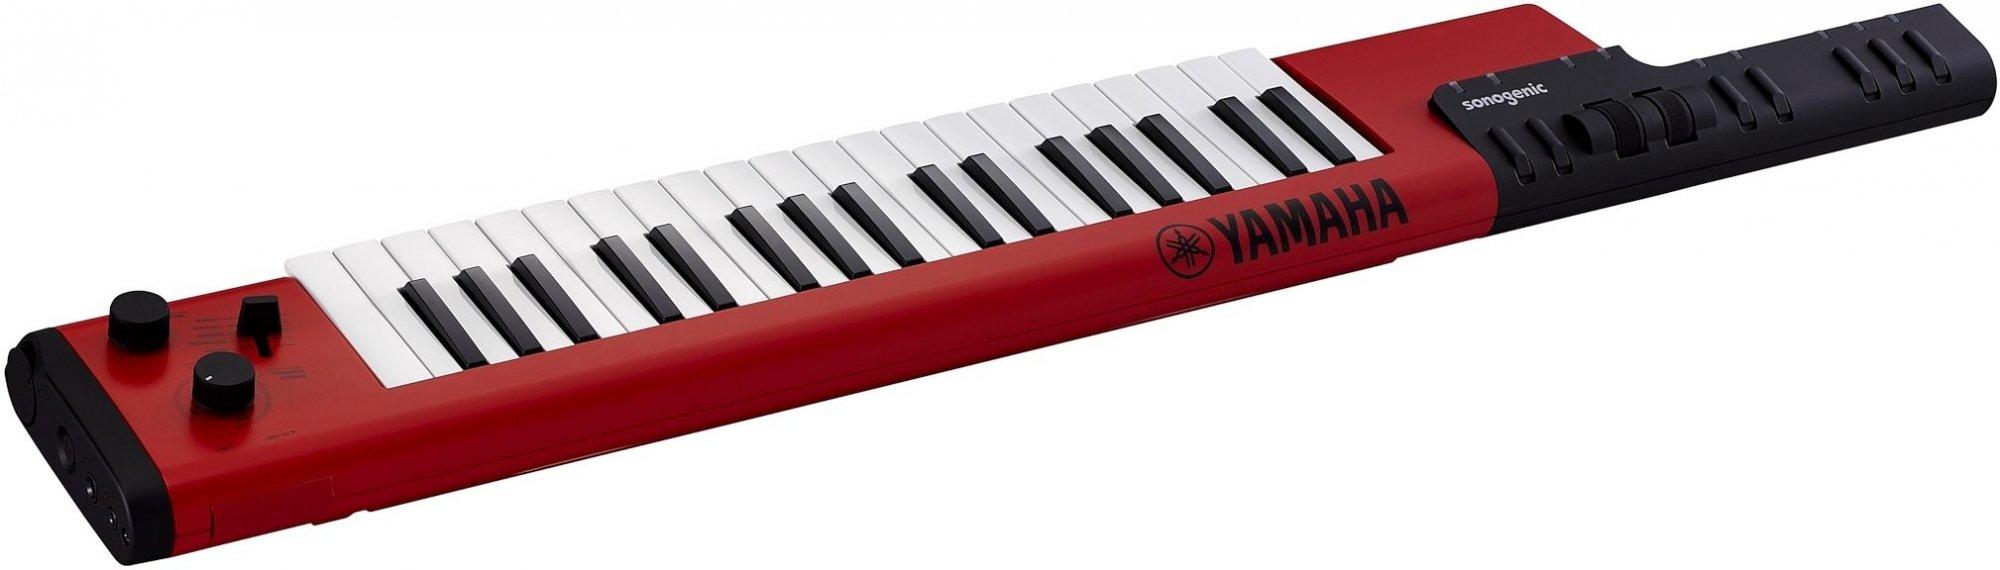 YAMAHA SHS500RD Sonogenic Keytar (Red)